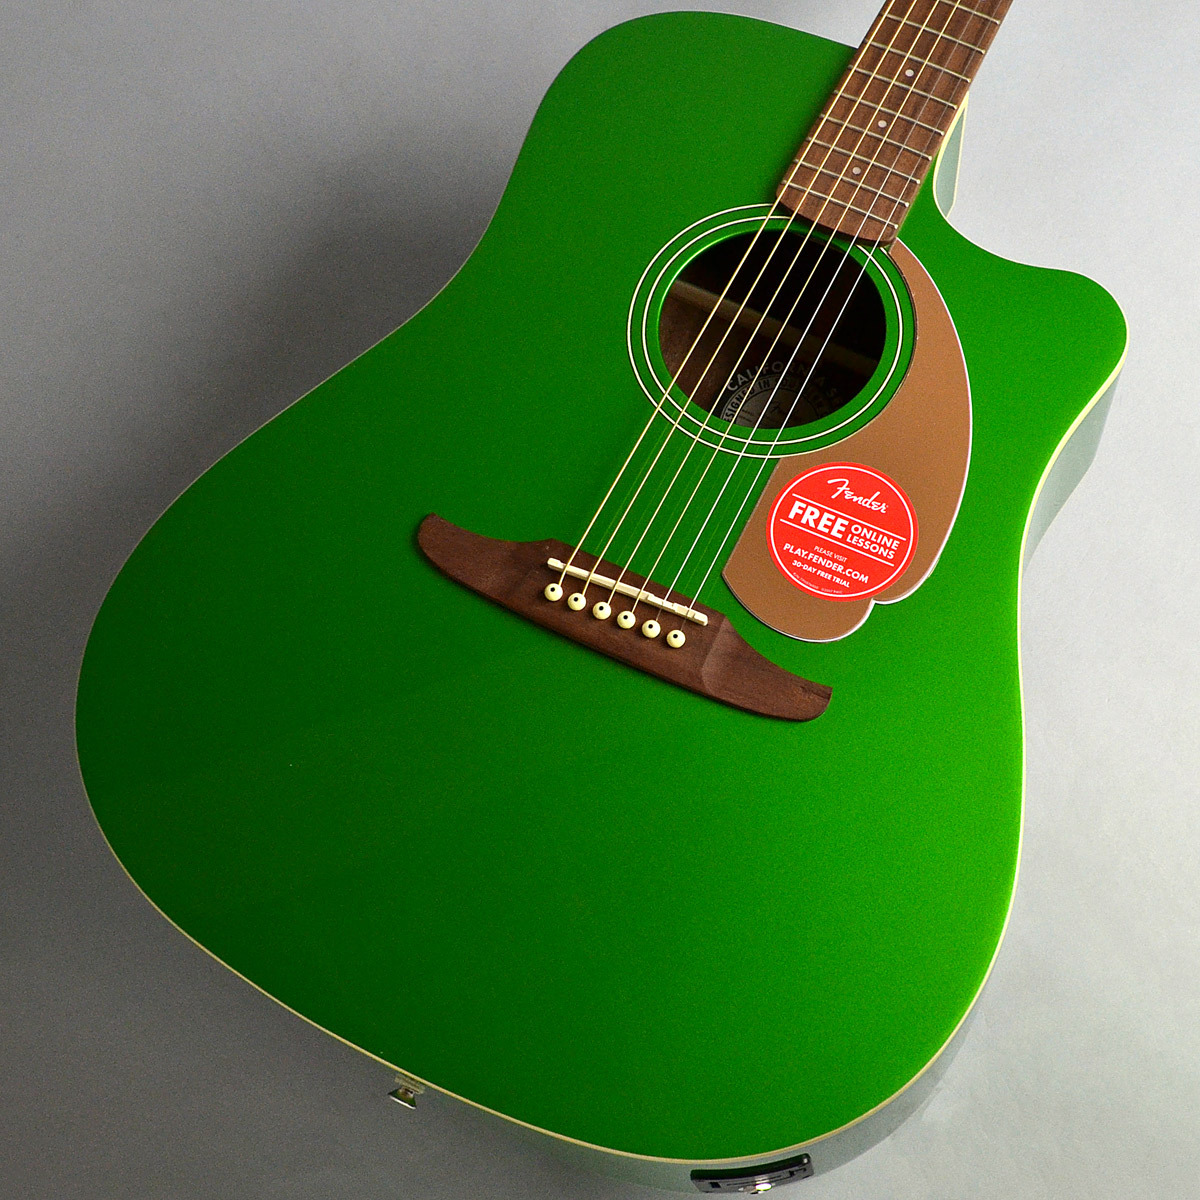 Fender Redondo Fender Player/Electric Jade Player/Electric Jade エレアコギター【フェンダー】【新宿PePe店】, コリョウチョウ:29596aa5 --- sunward.msk.ru